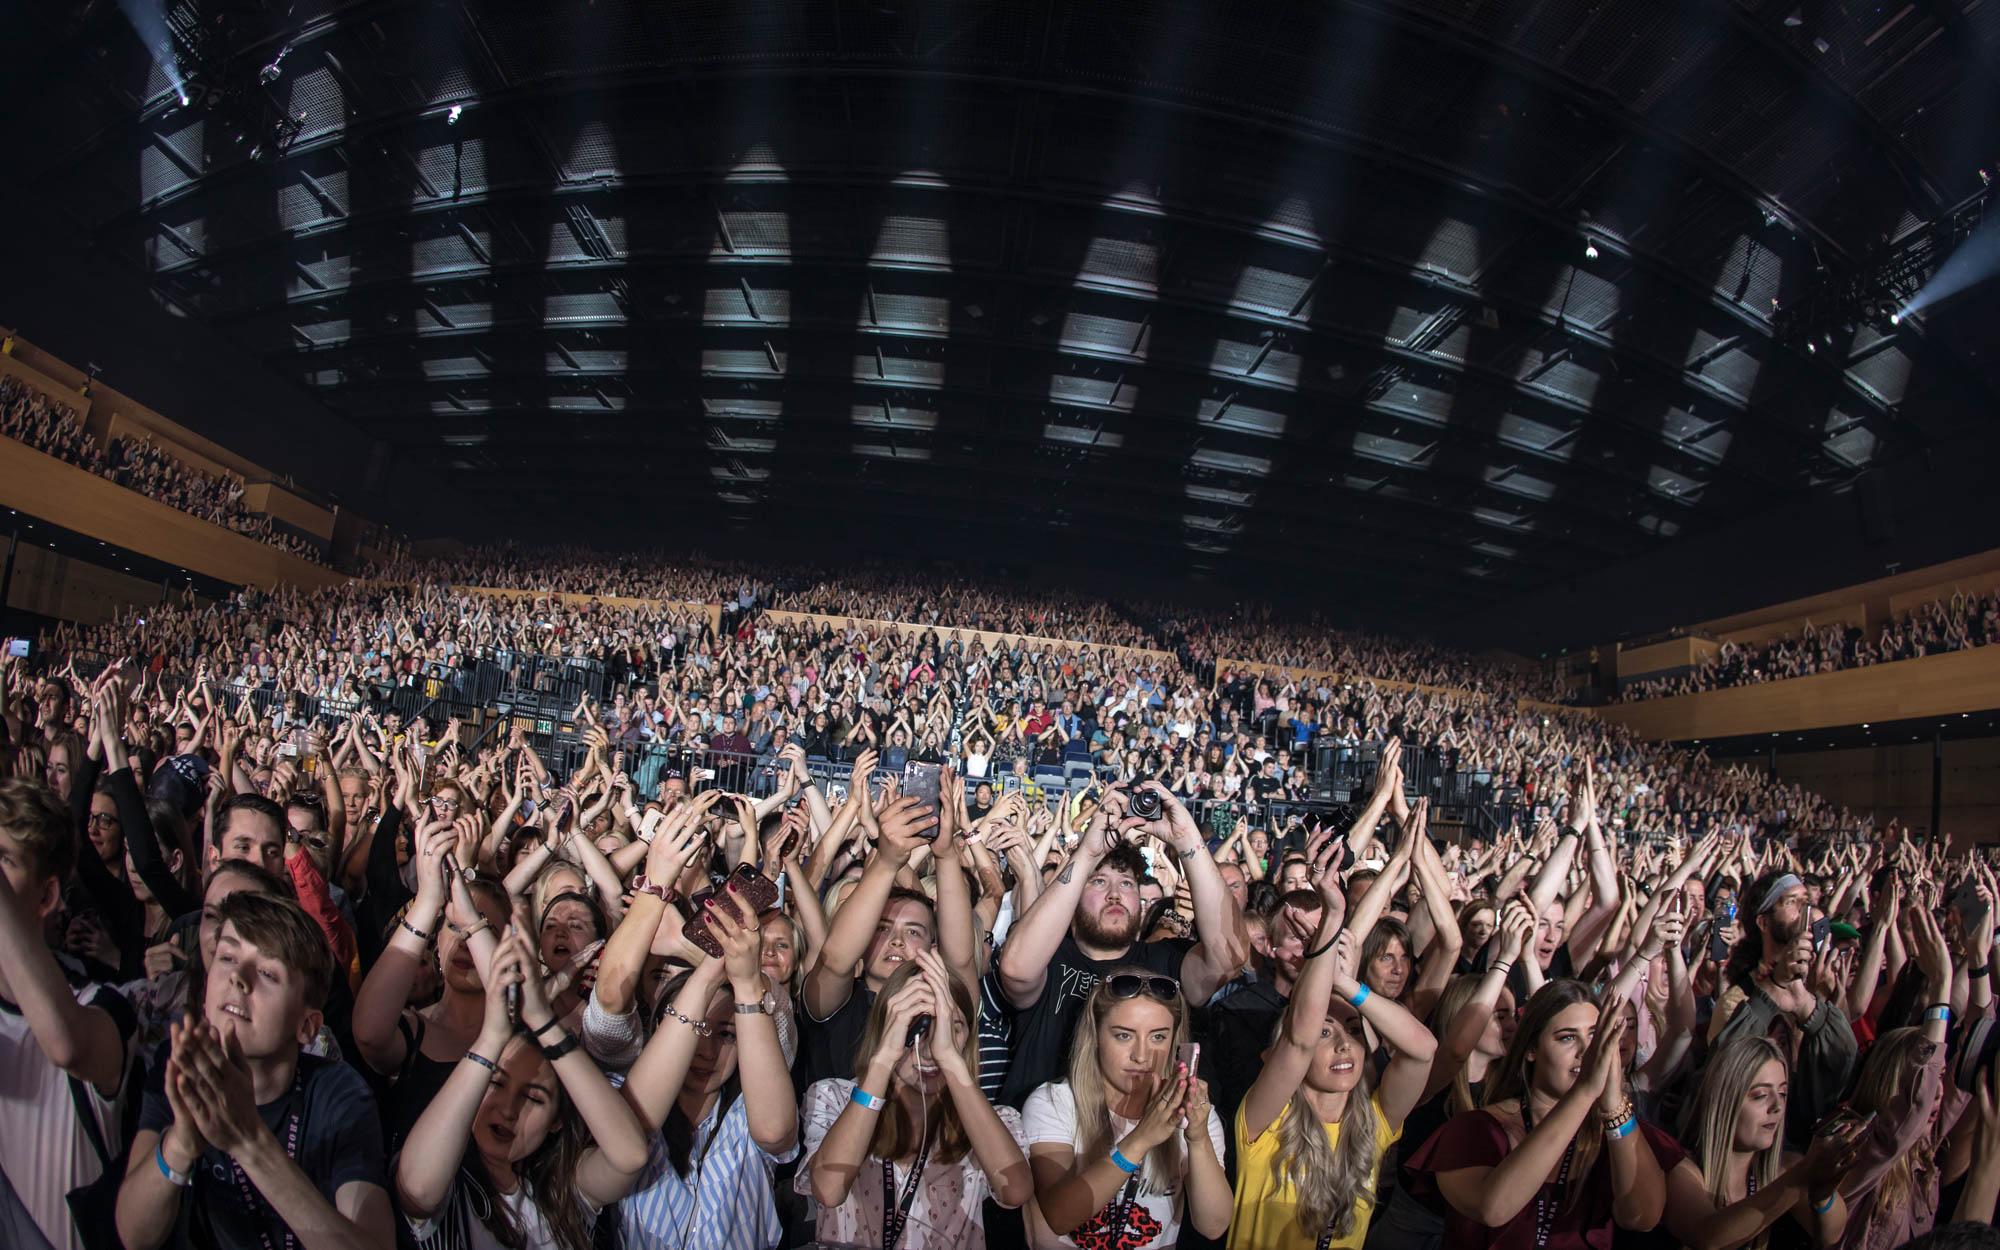 The crowd enjoying Rita Ora performing at the Bournemouth International Centre.